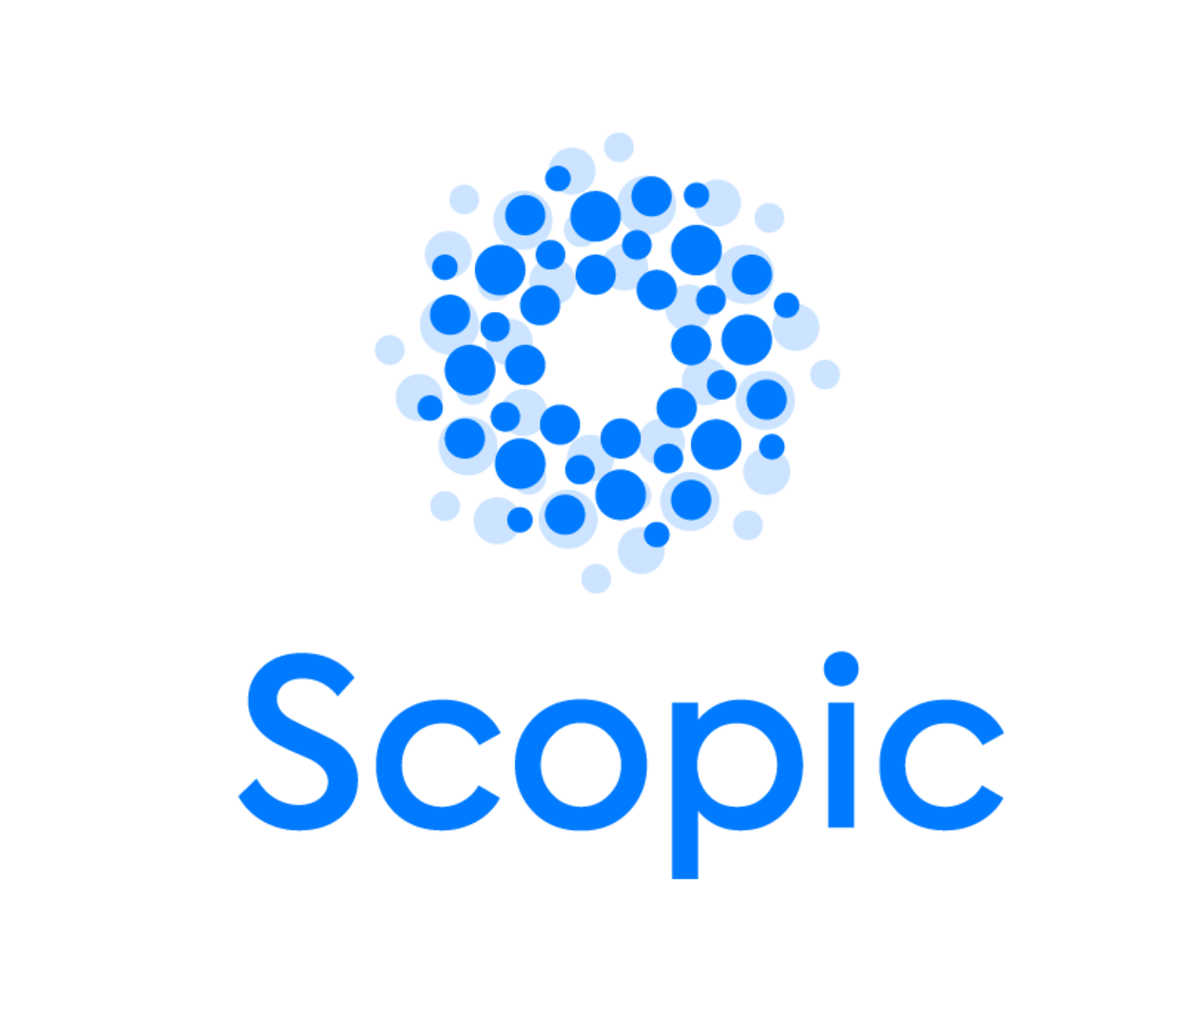 Scopic logo